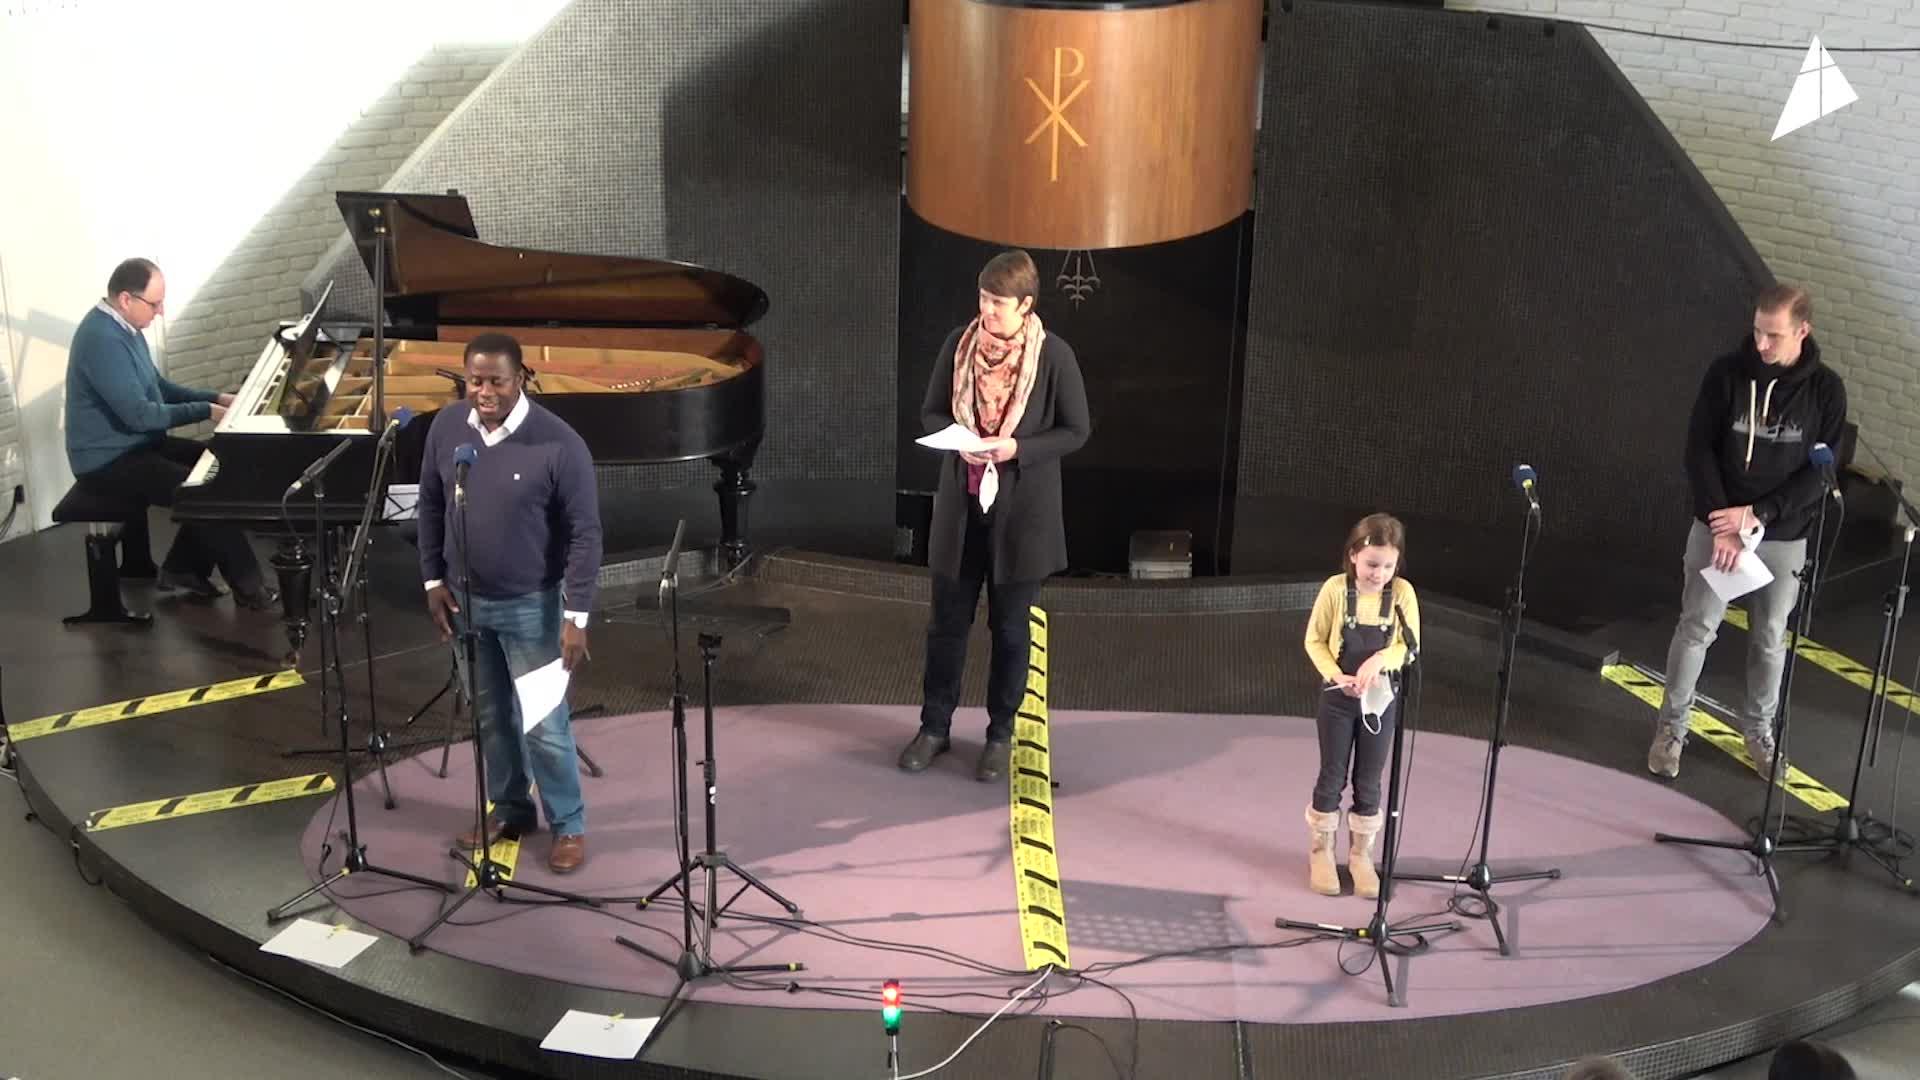 Radio Gottesdienst am 21. Februar - Livestream aus der Christuskirche Altona